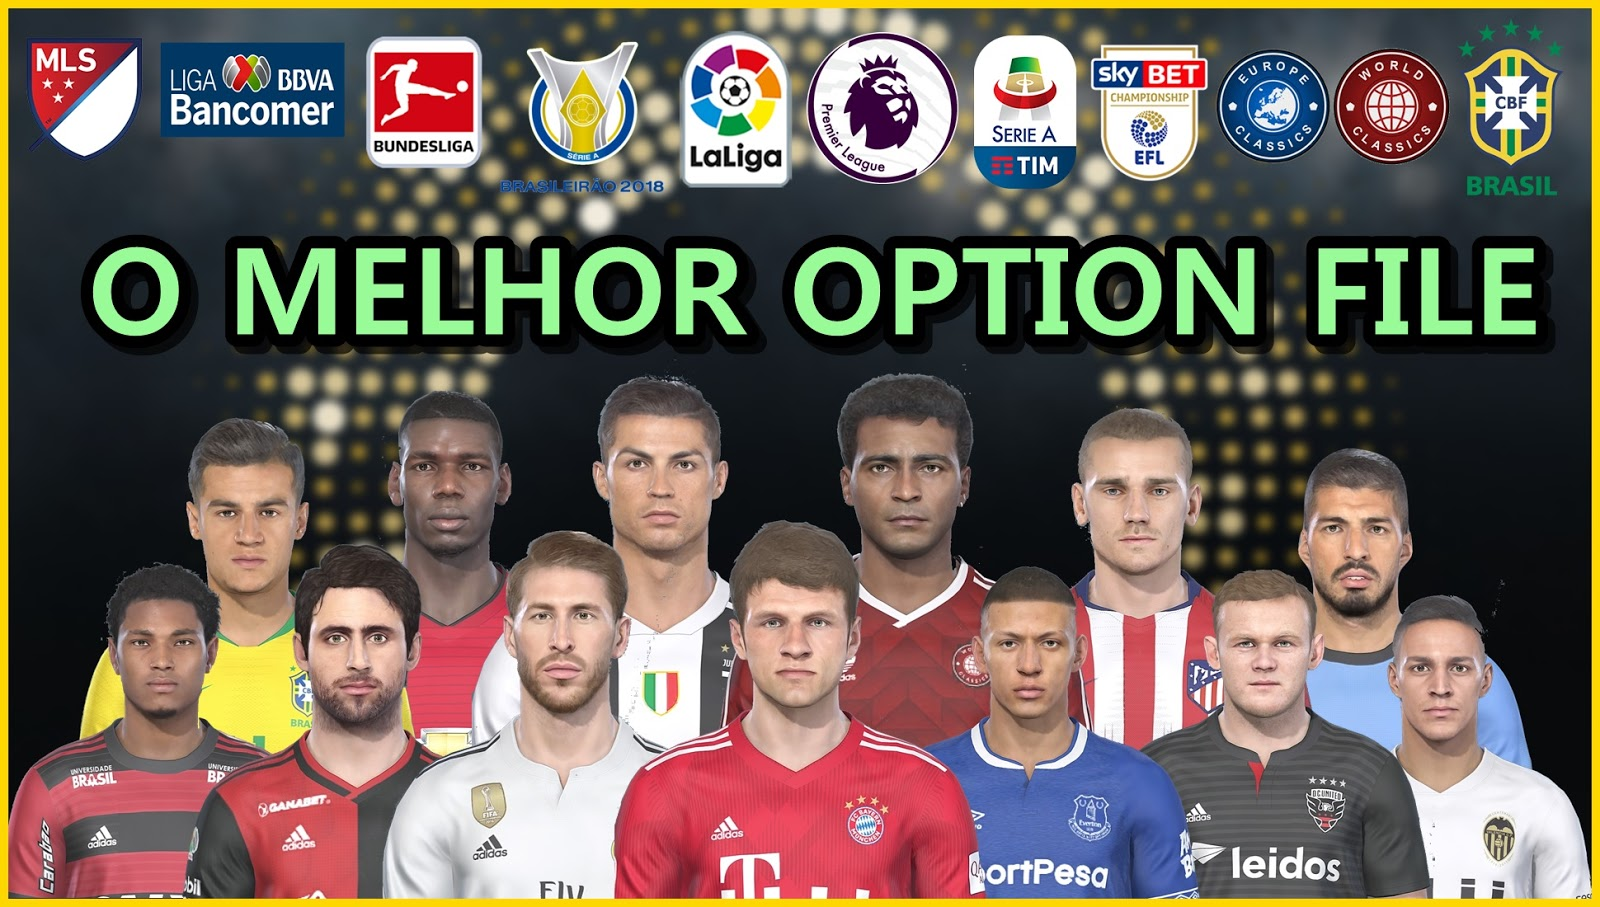 Pes Vício BR: PES 2019 OPTION FILE COMPLETO C/ MLS, LIGA MX